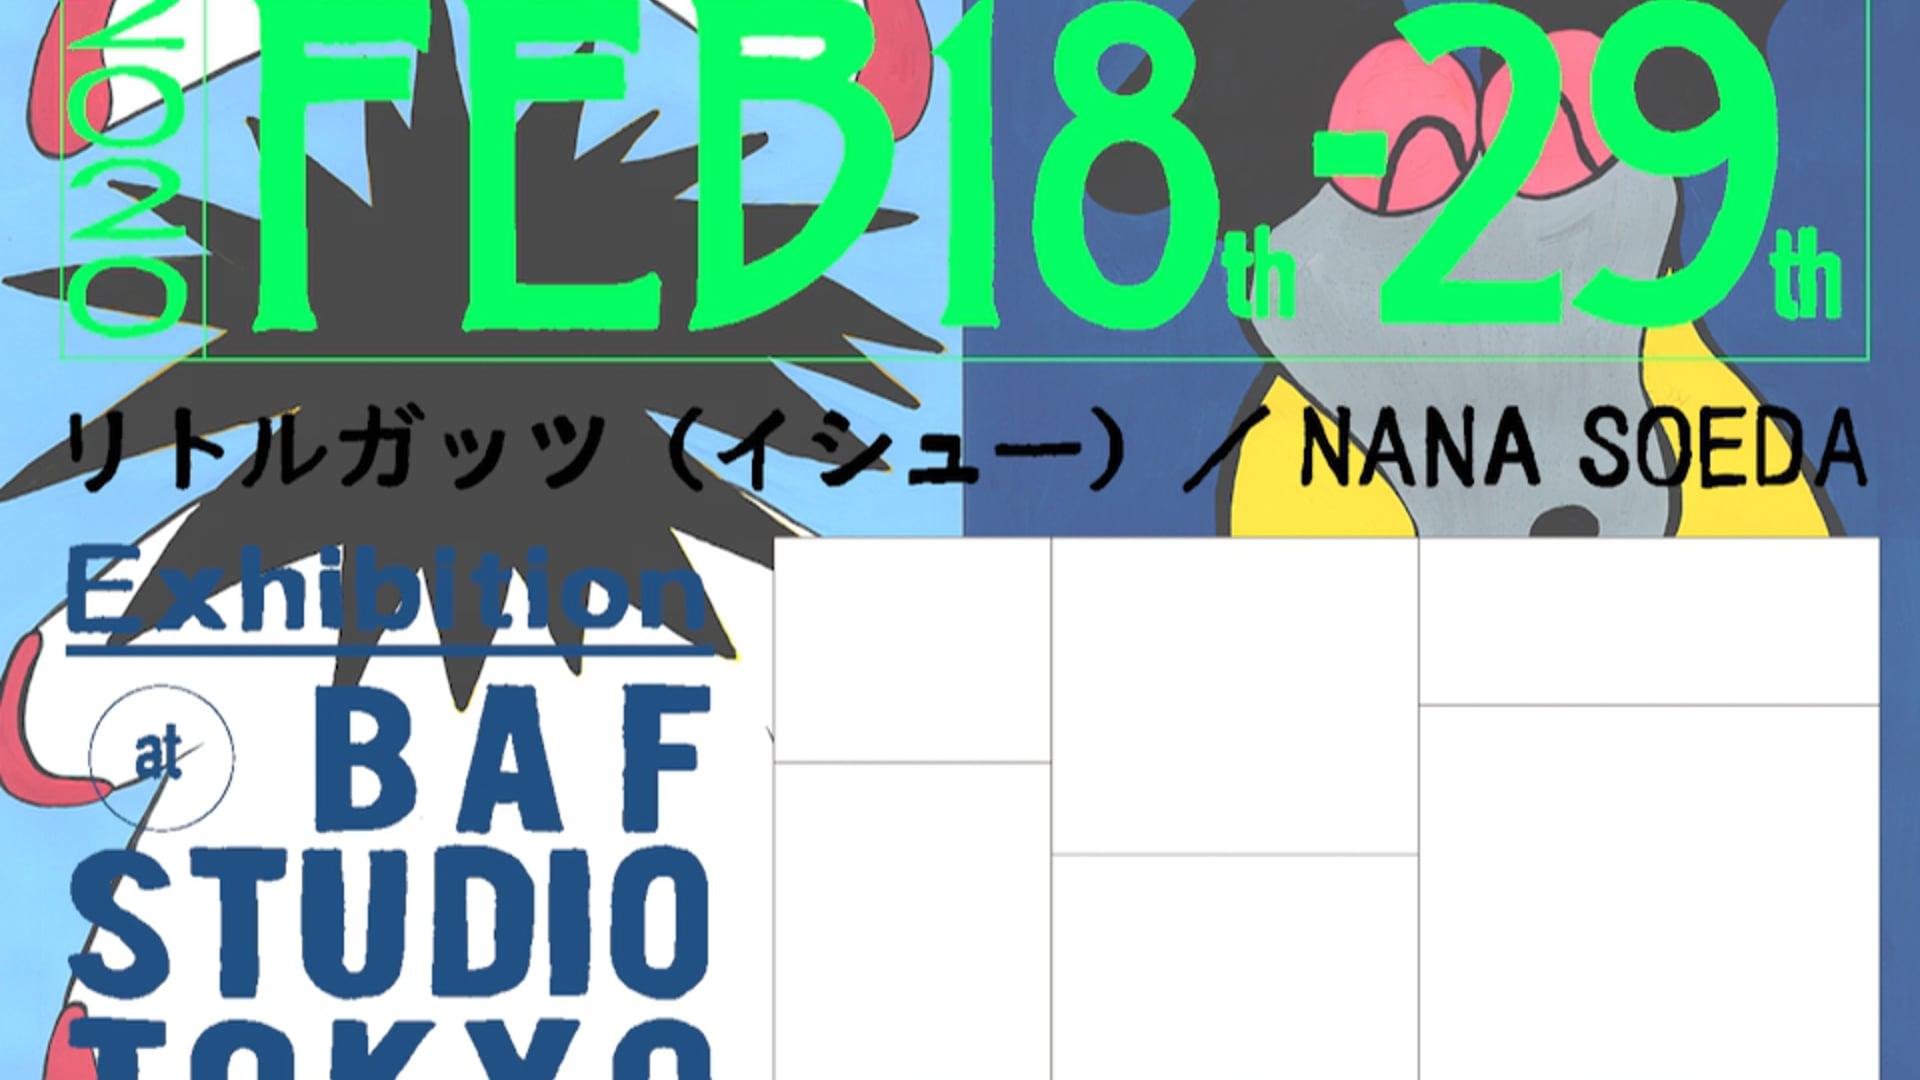 "BAF studio tokyo presents  添田 菜那/Nana Soeda solo exhibiton ""リトルガッツ(イシュー)"""